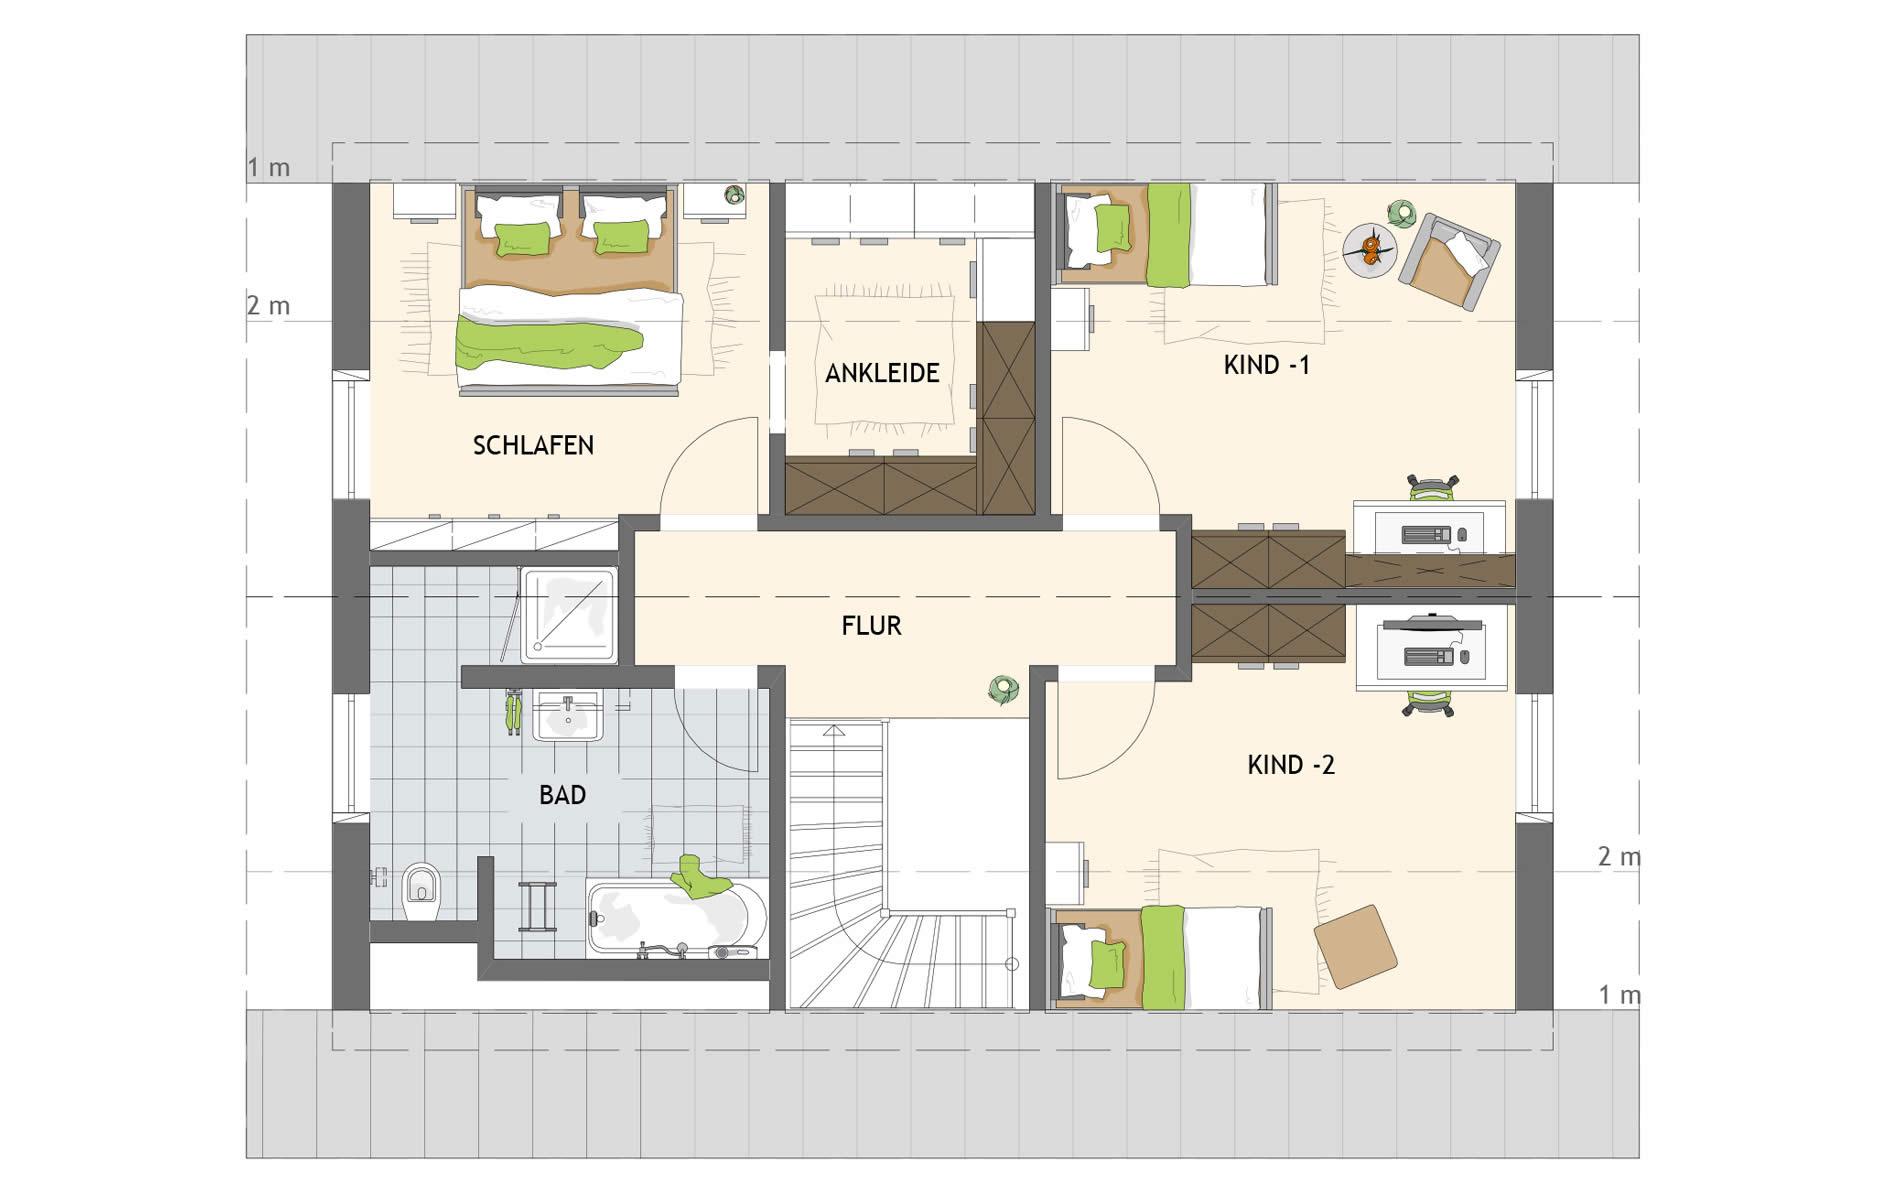 Dachgeschoss JUNO 100 S100 von FingerHaus GmbH